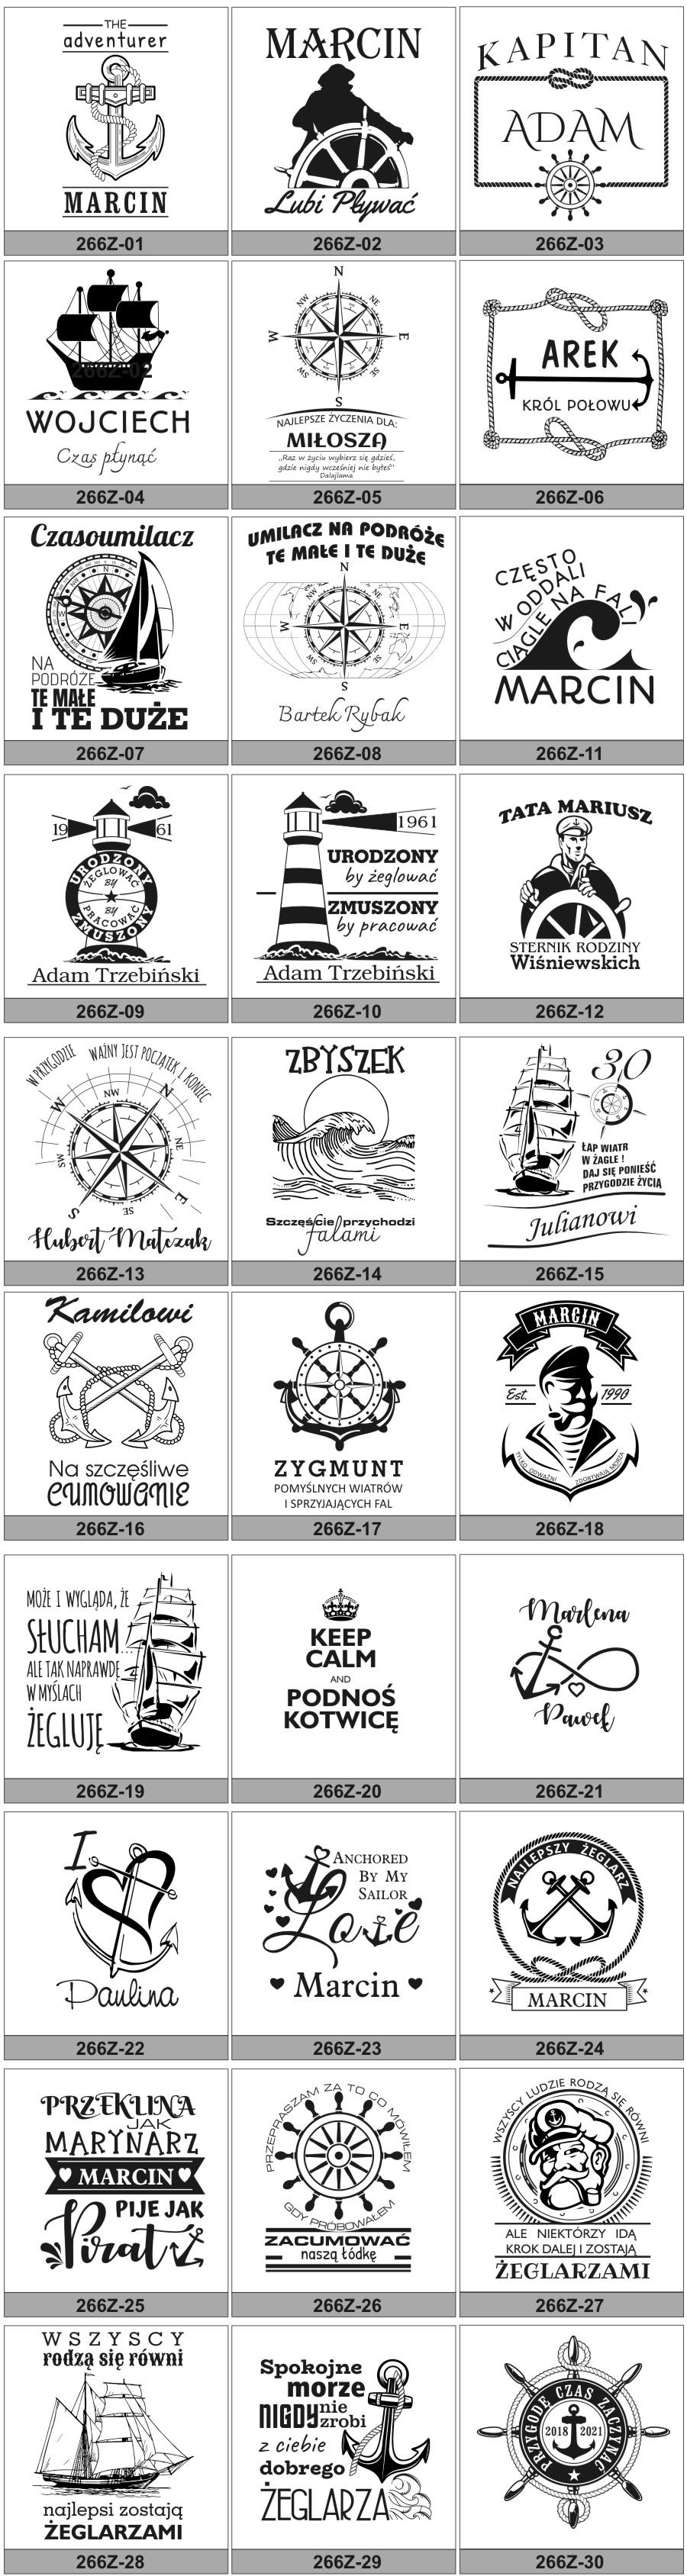 rysunki na kufle dla żeglarza